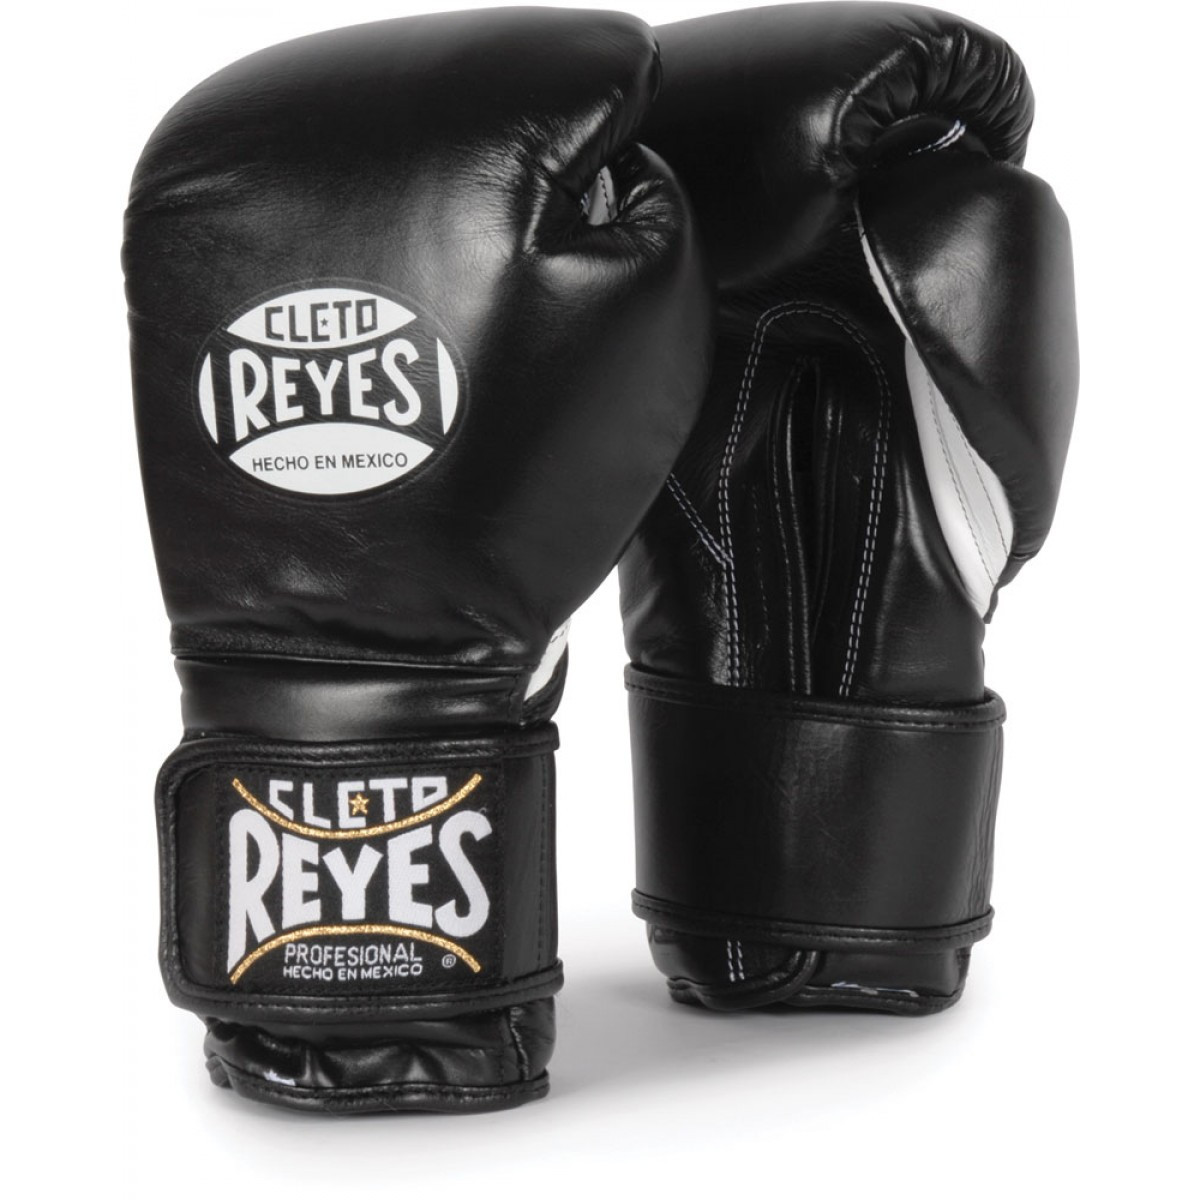 Gym Gloves And Loops: Cleto Reyes Hook & Loop Boxing Gloves Black Color